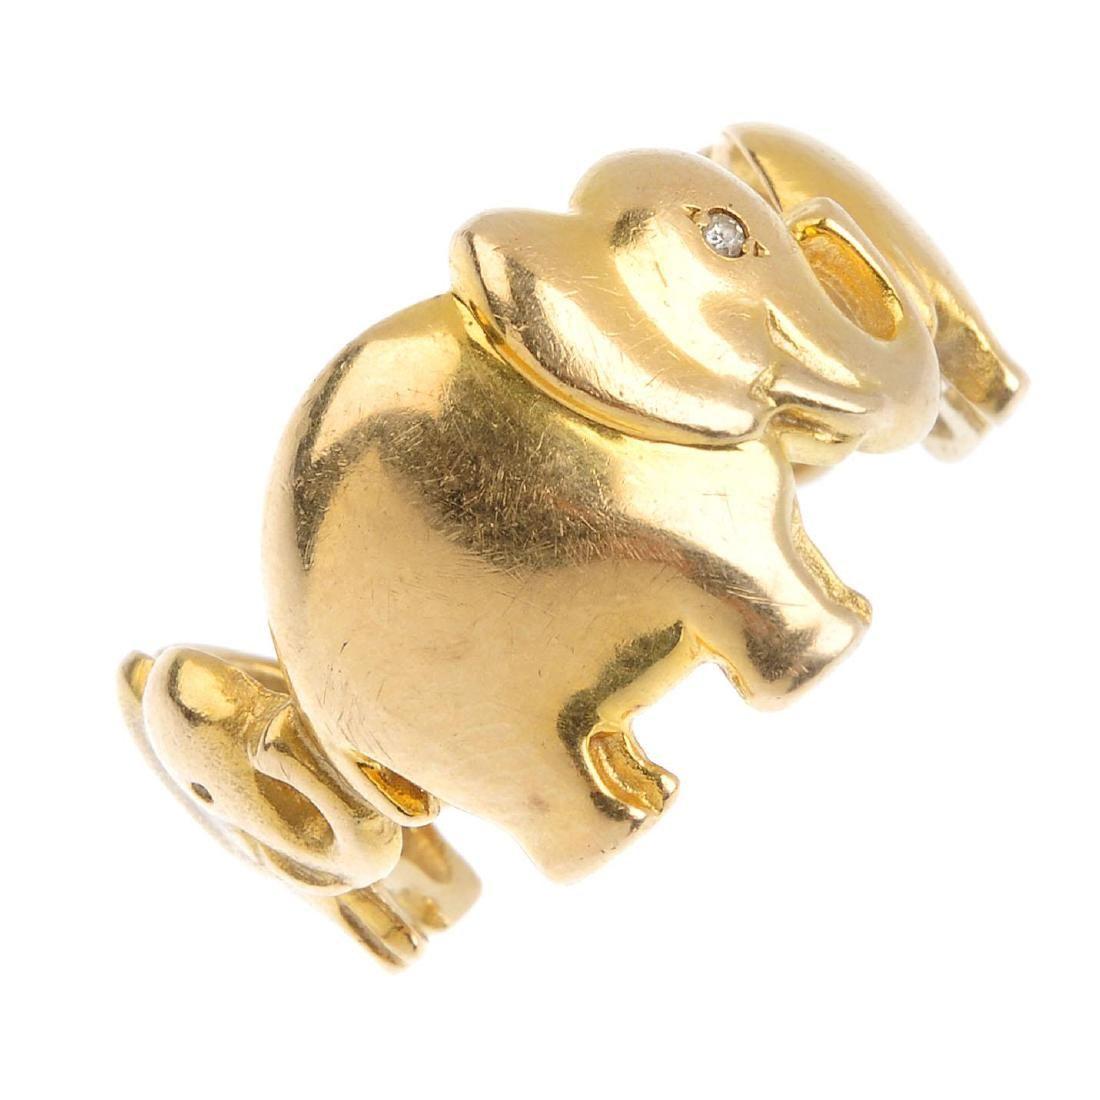 A diamond novelty ring. Designed as three graduated